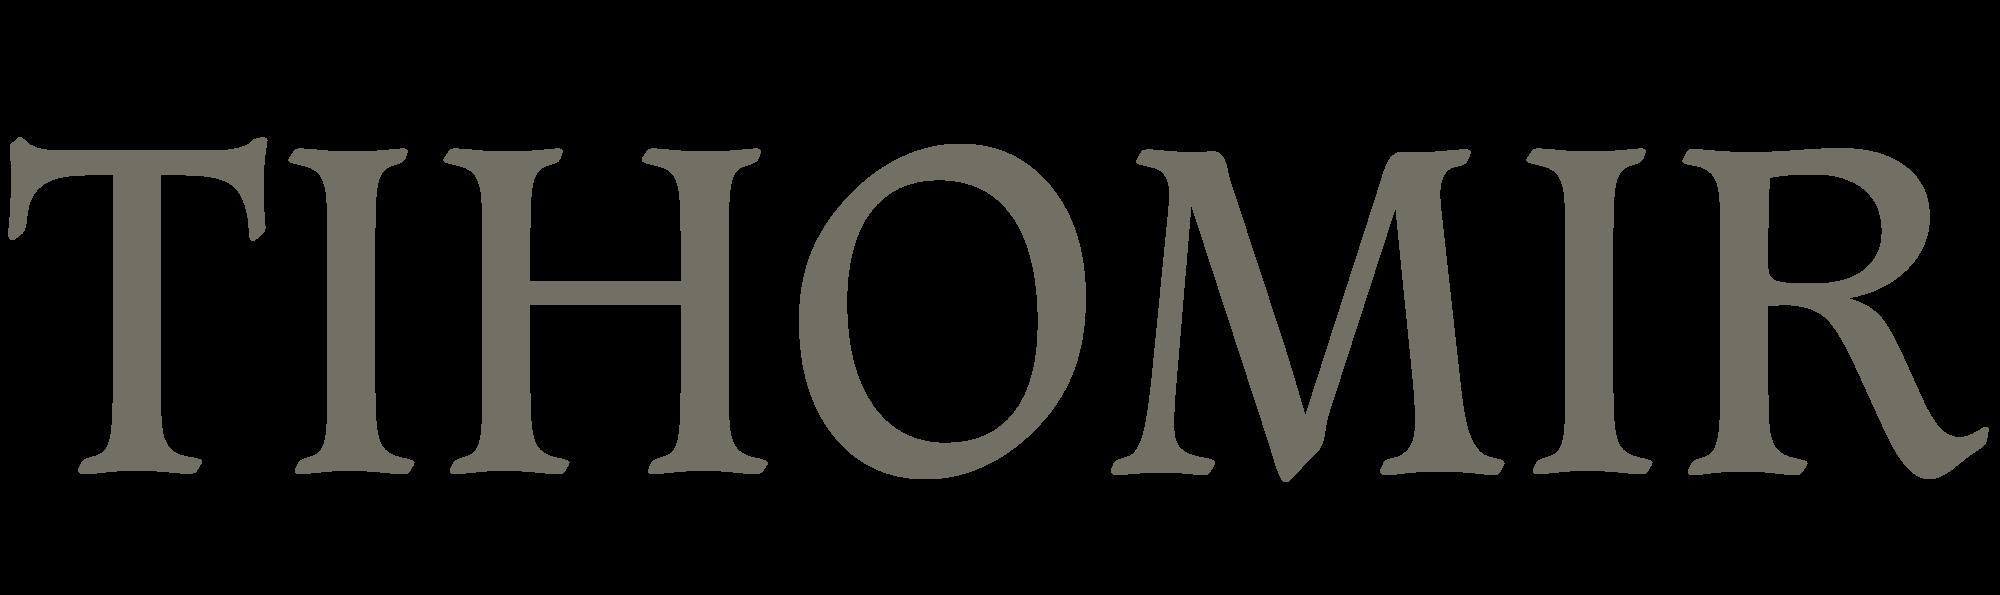 Значение мужского имени Тихомир